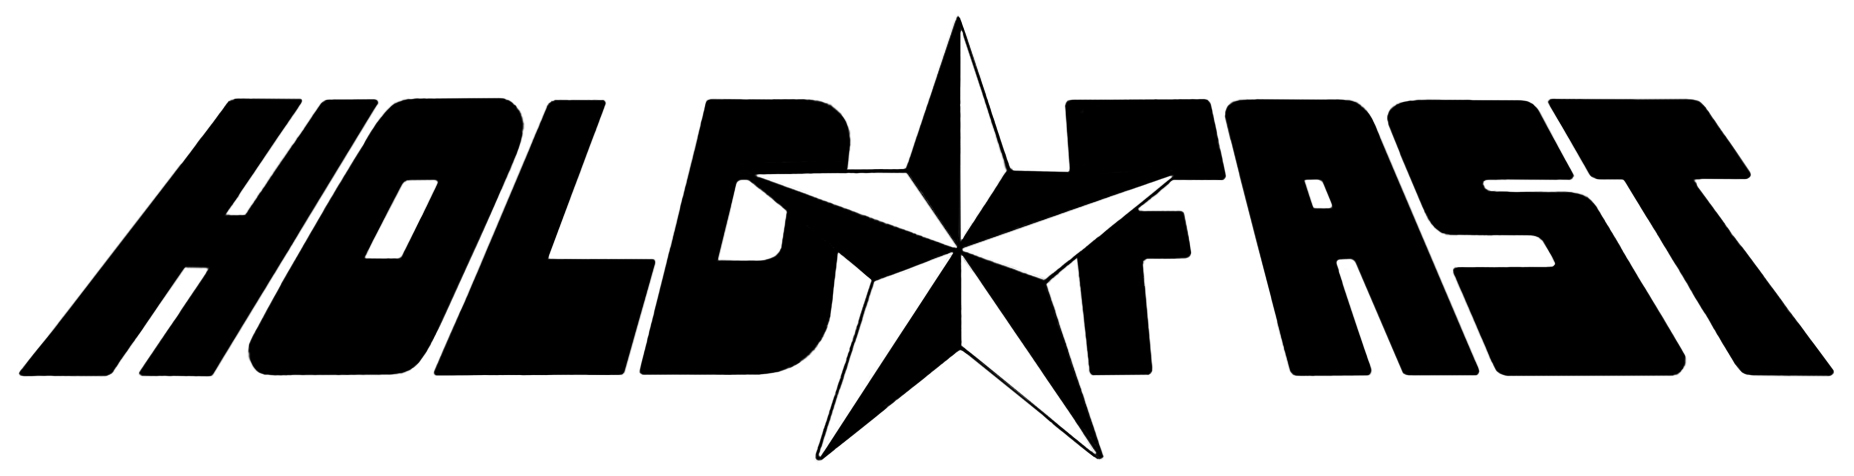 http://www.holdfastrecordings.com/images/holdfast_logo.jpg